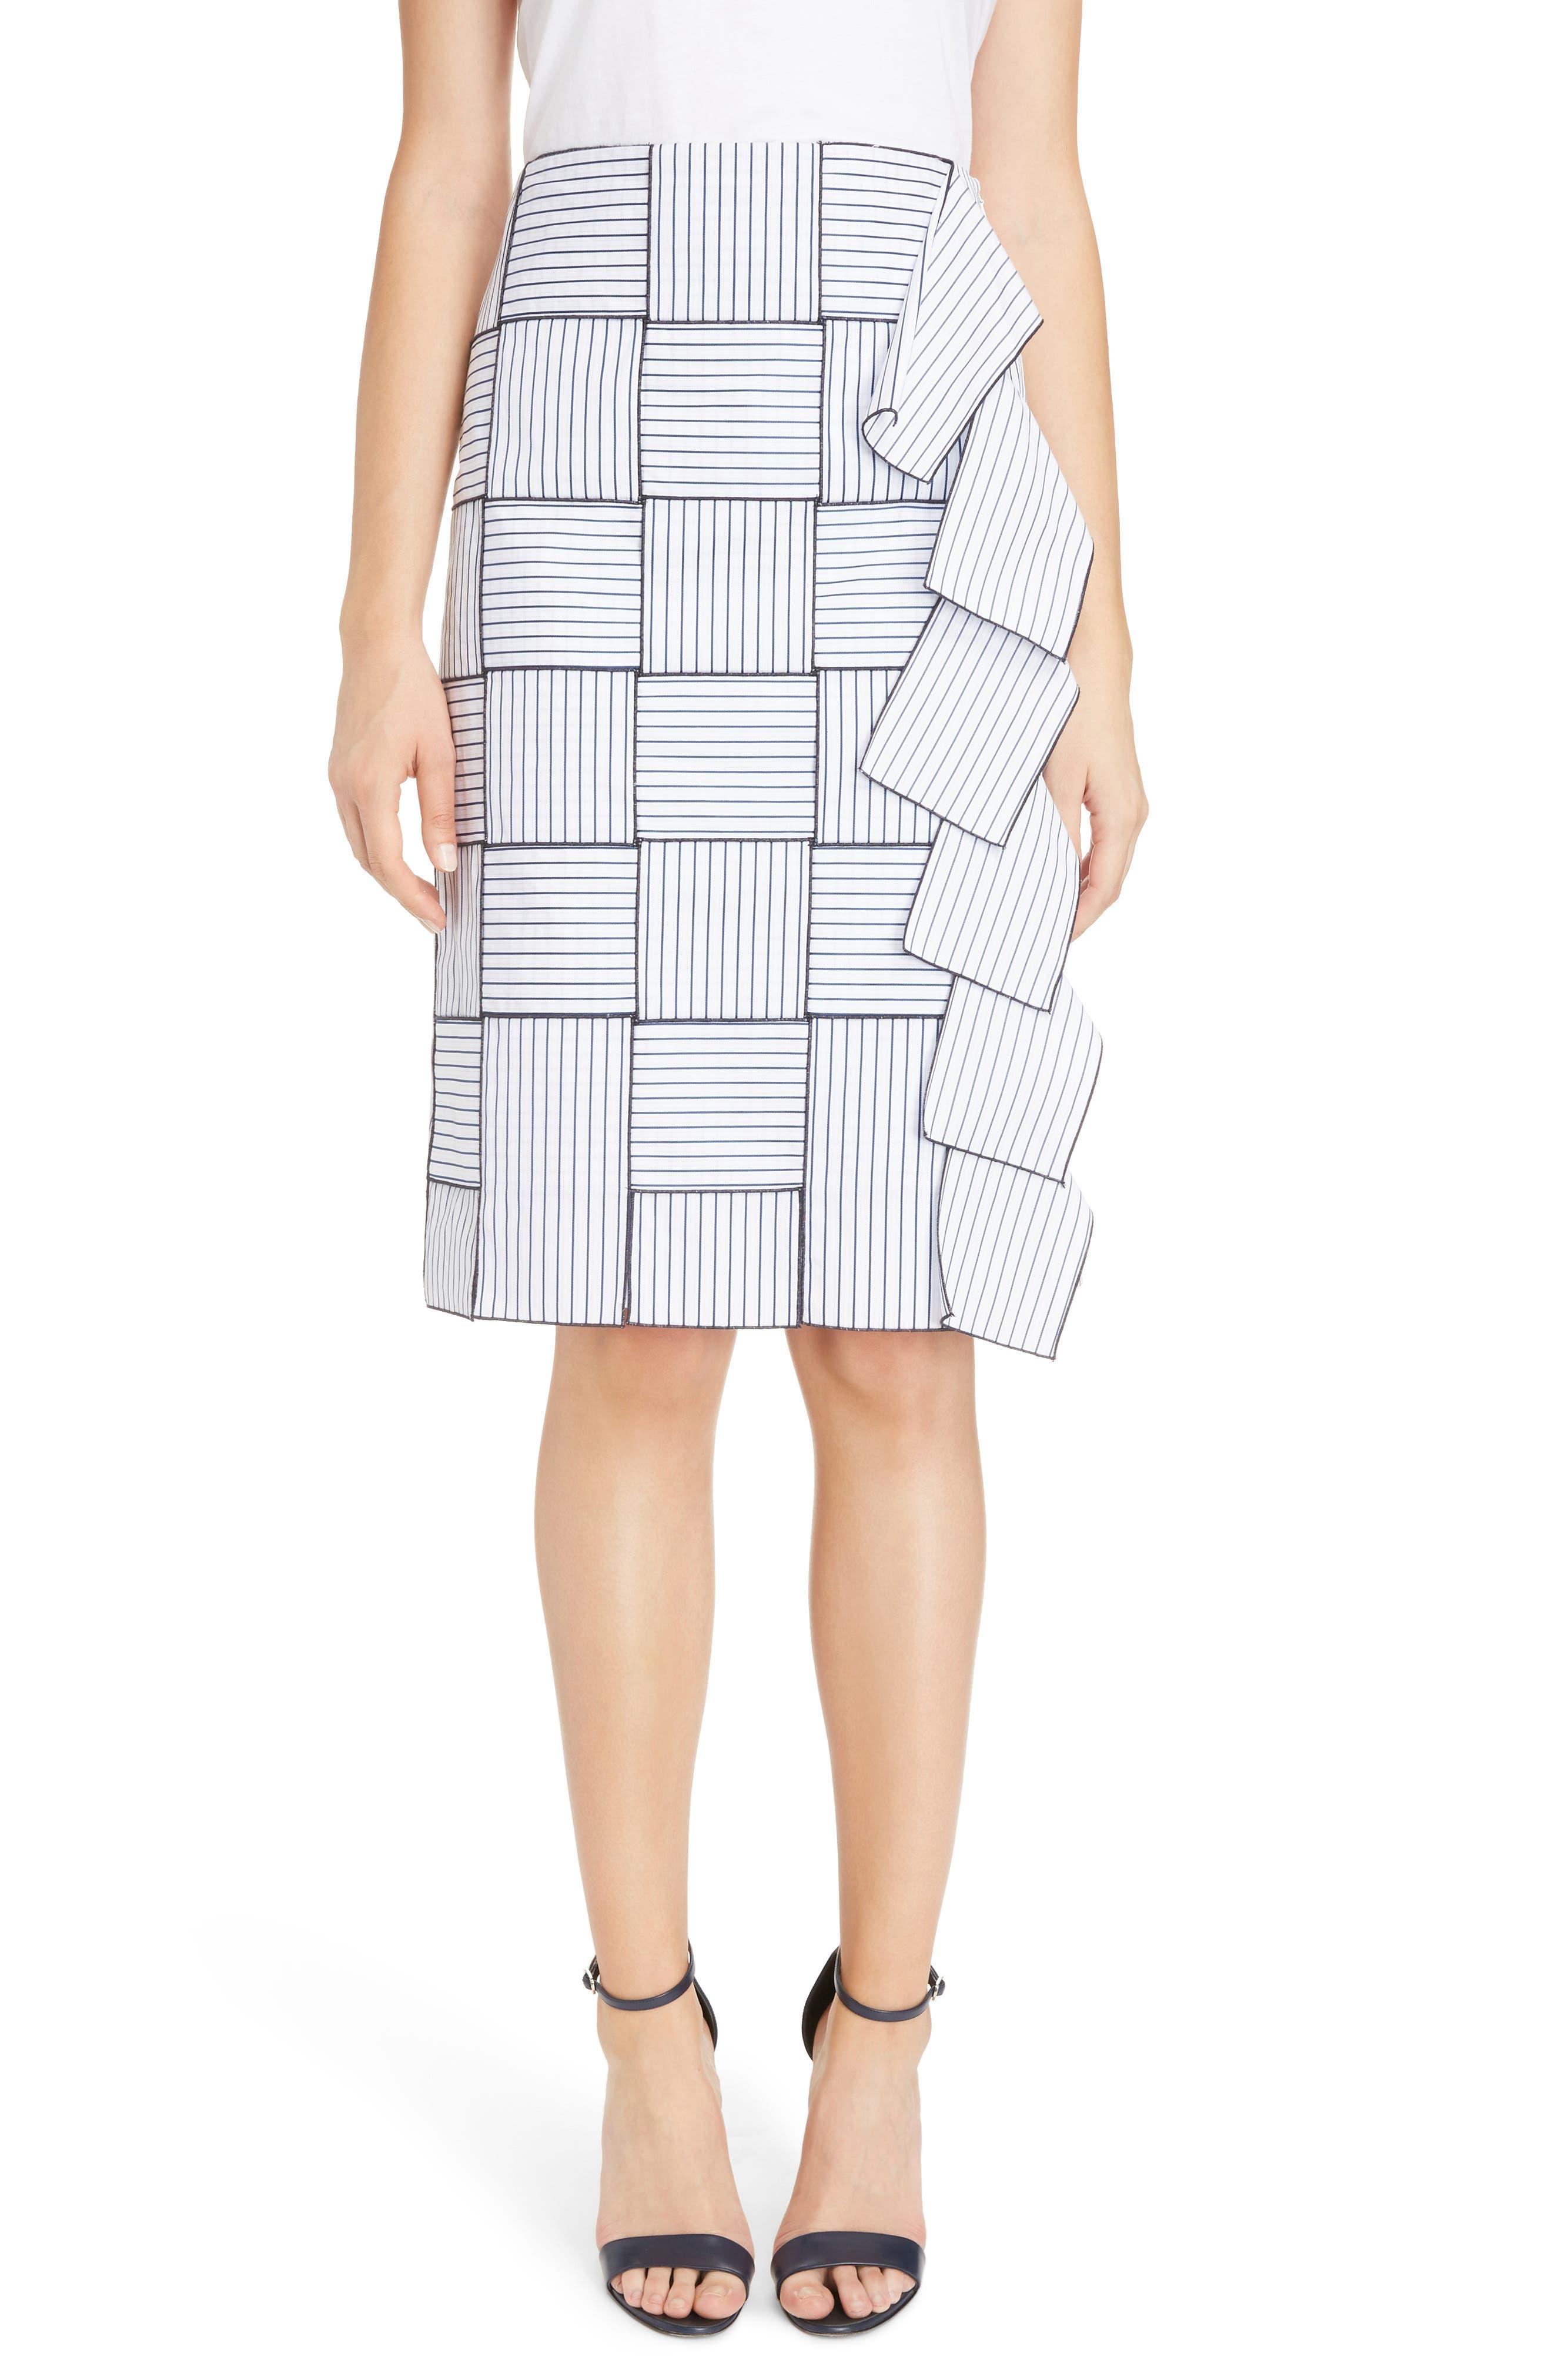 Basket-Weave Pencil Skirt,                         Main,                         color, White/ Navy